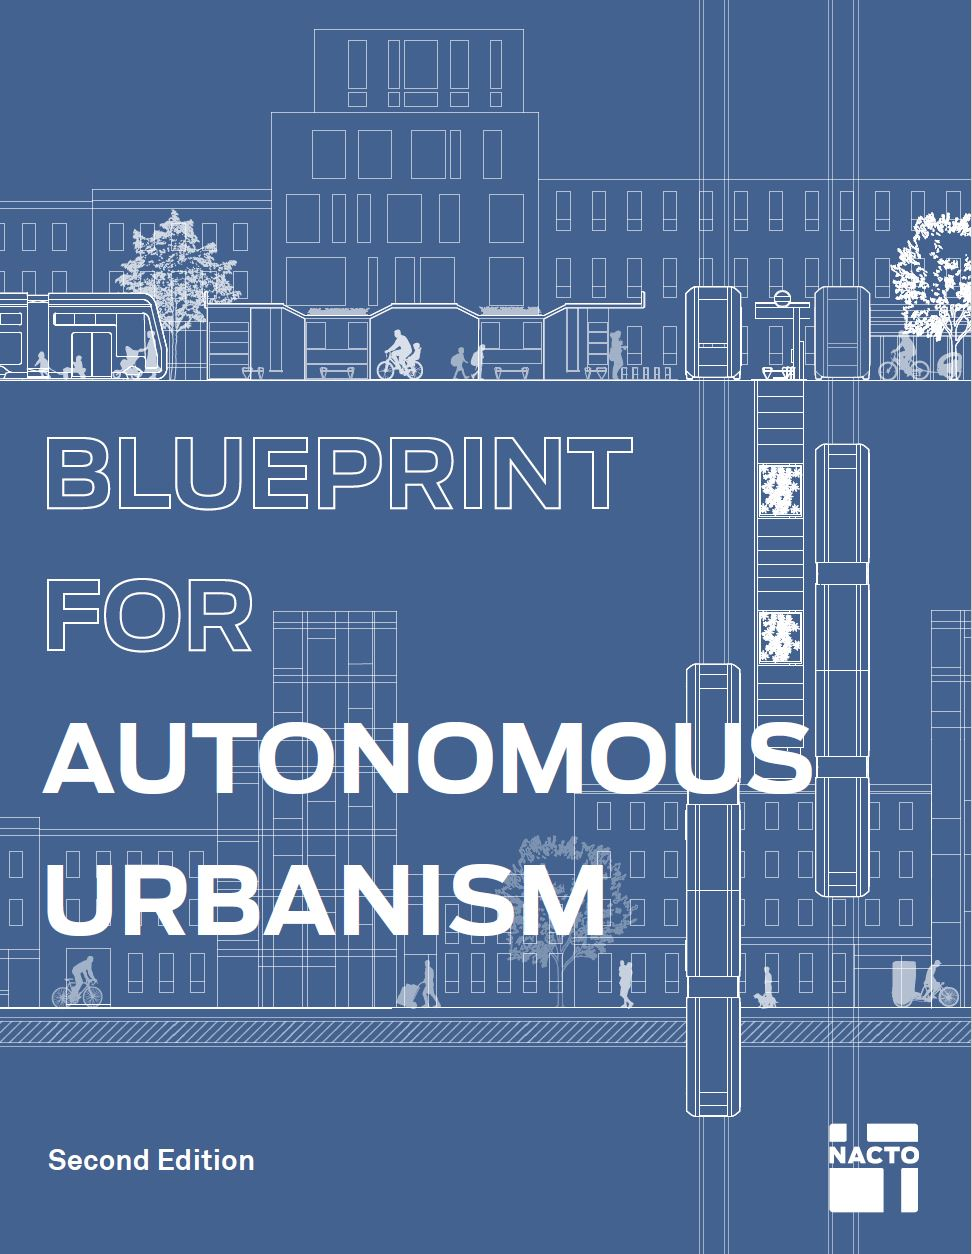 Blueprint for Autonomous Urbanism: Second Edition | National Association of City Transportation Officials